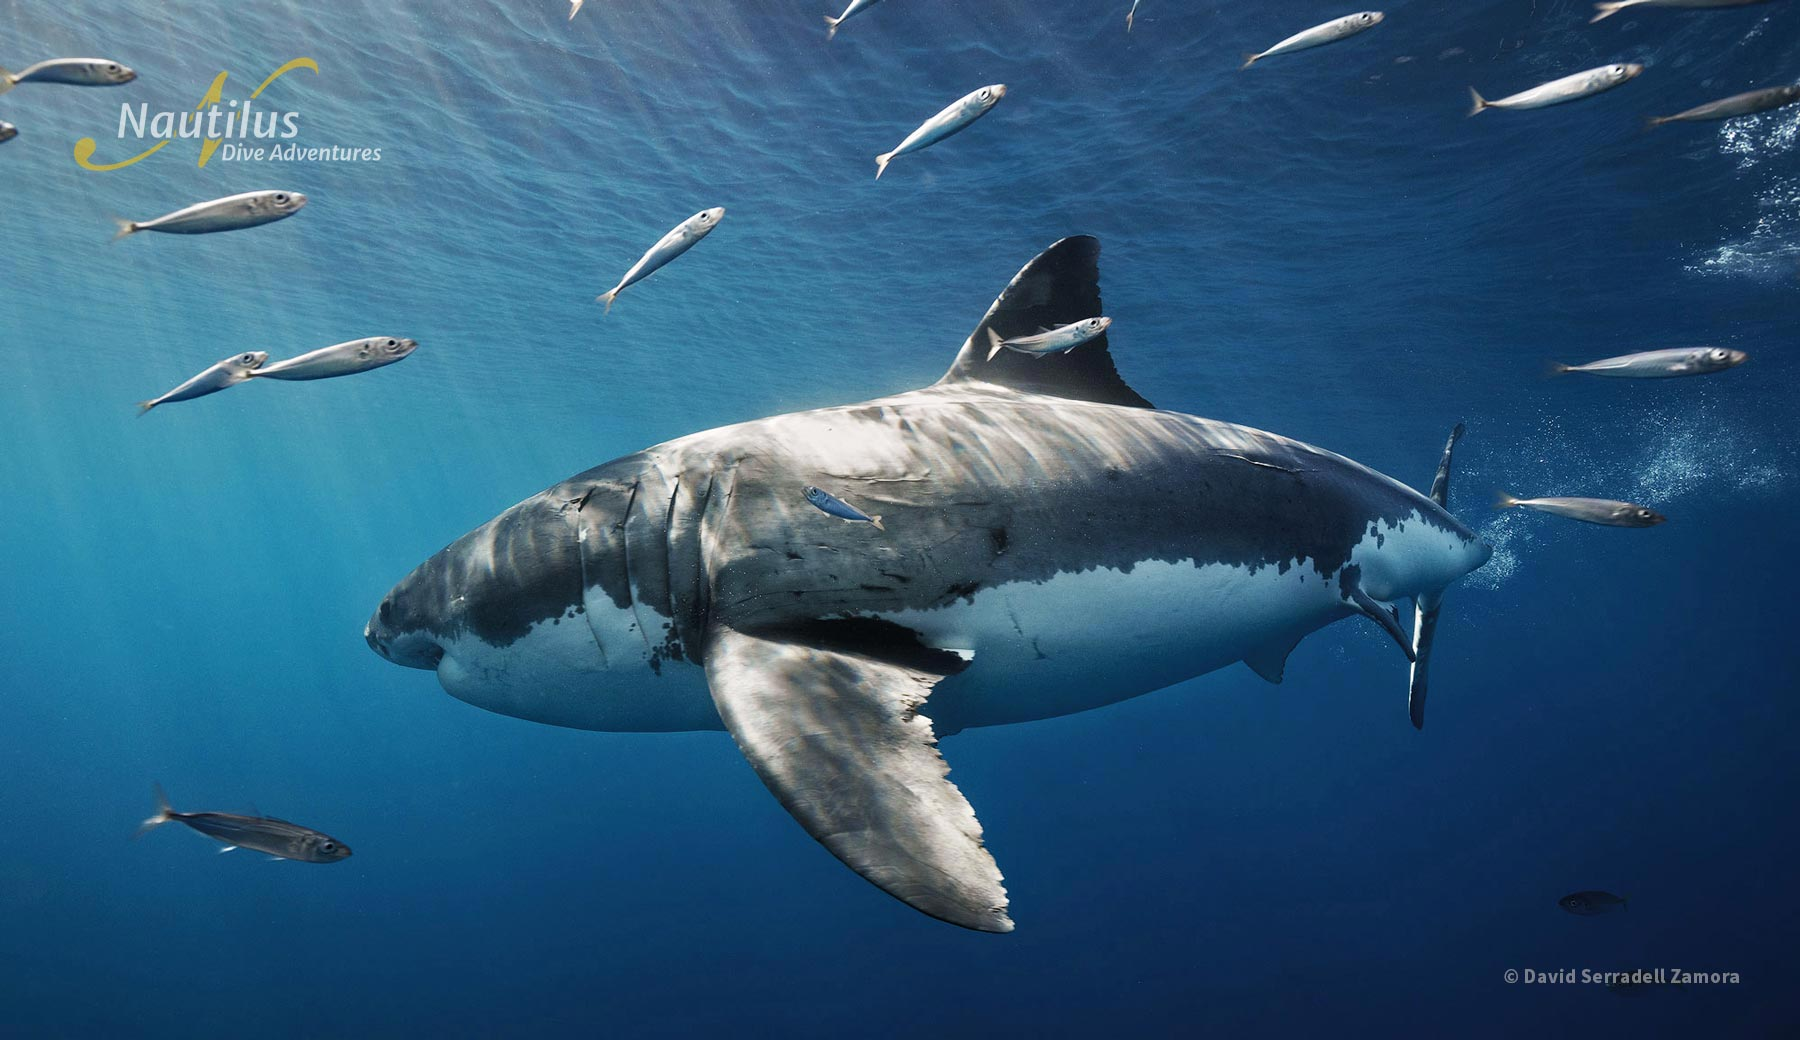 Nautilus Shark identification program